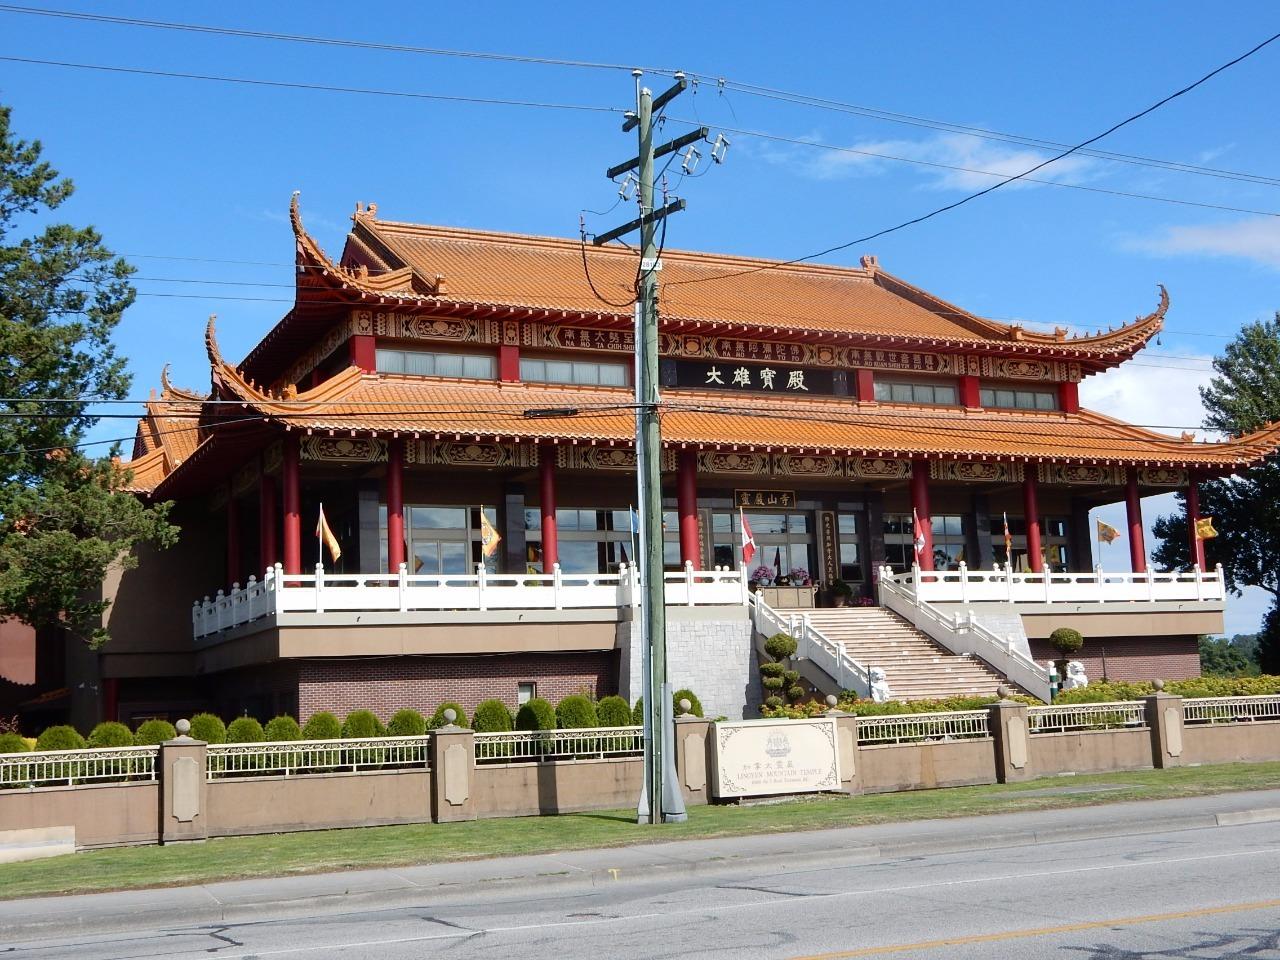 Ling Yan Mountain Temple